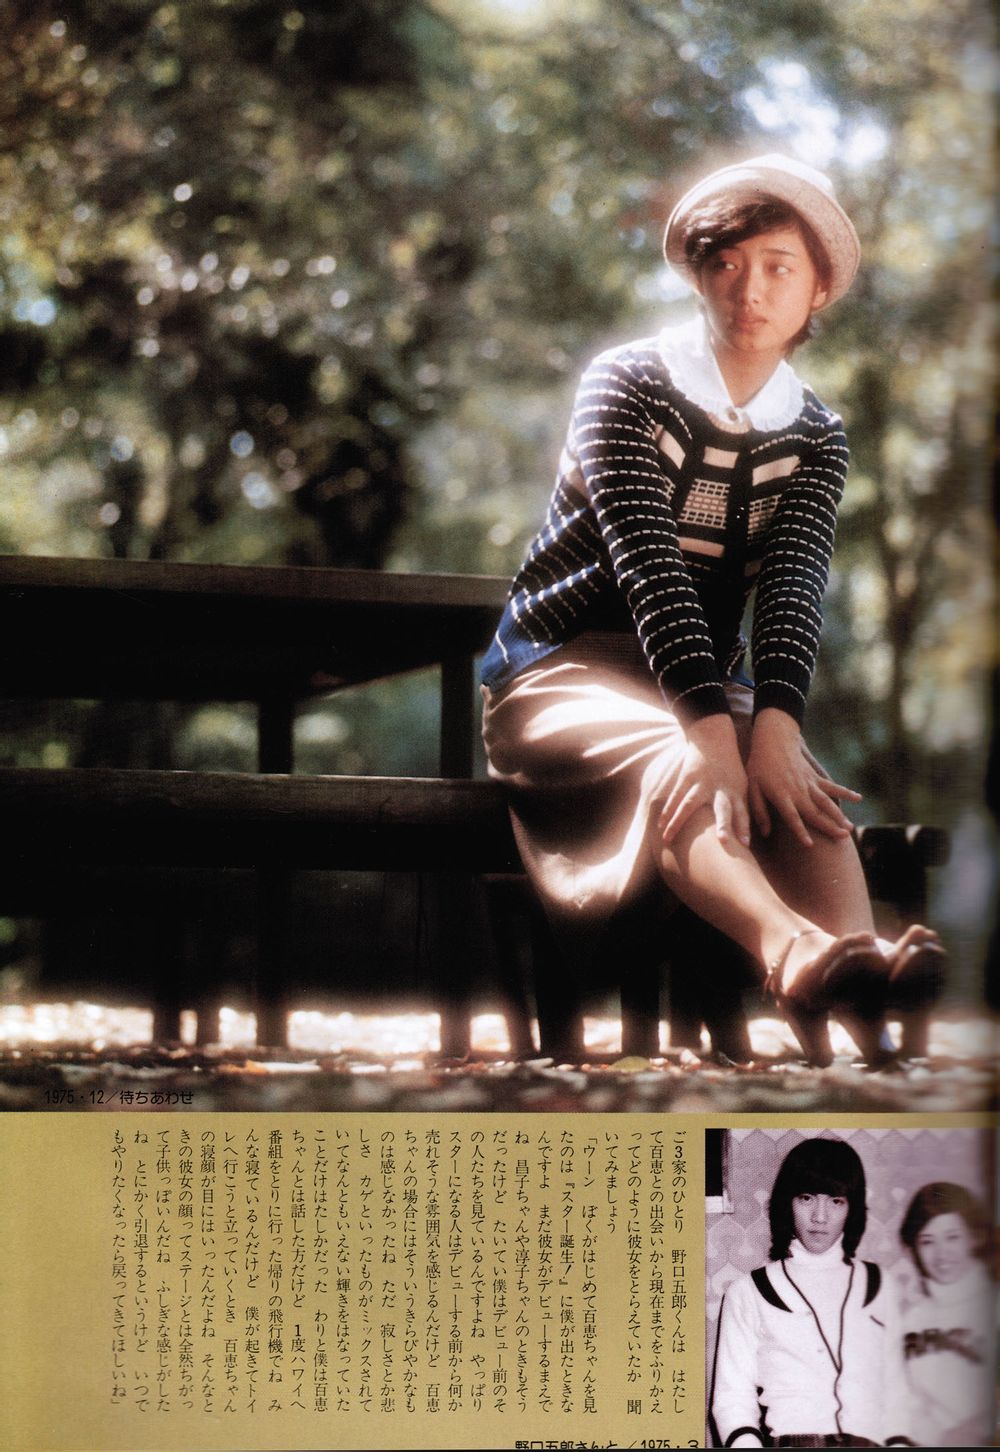 Feet Tomoko Yamaguchi nudes (21 pics) Cleavage, YouTube, cameltoe